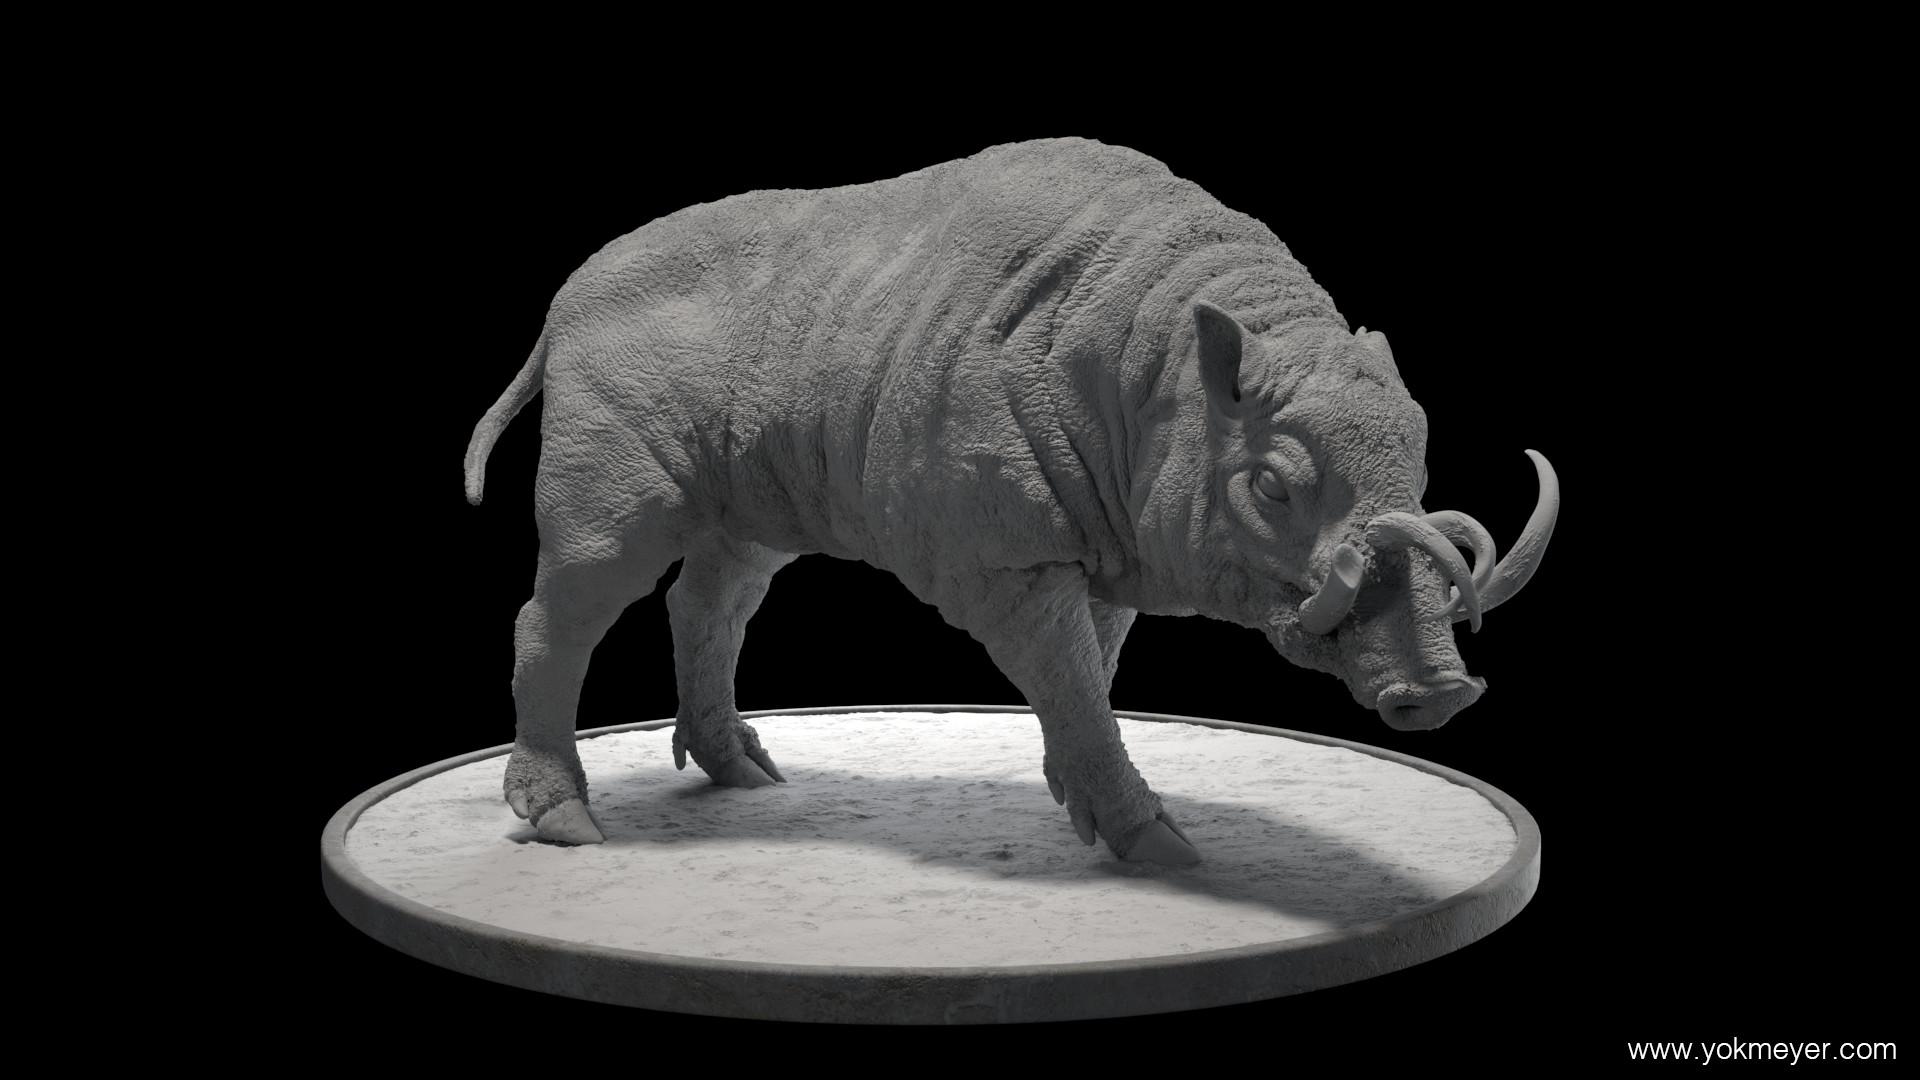 Yok meyer clay 1101